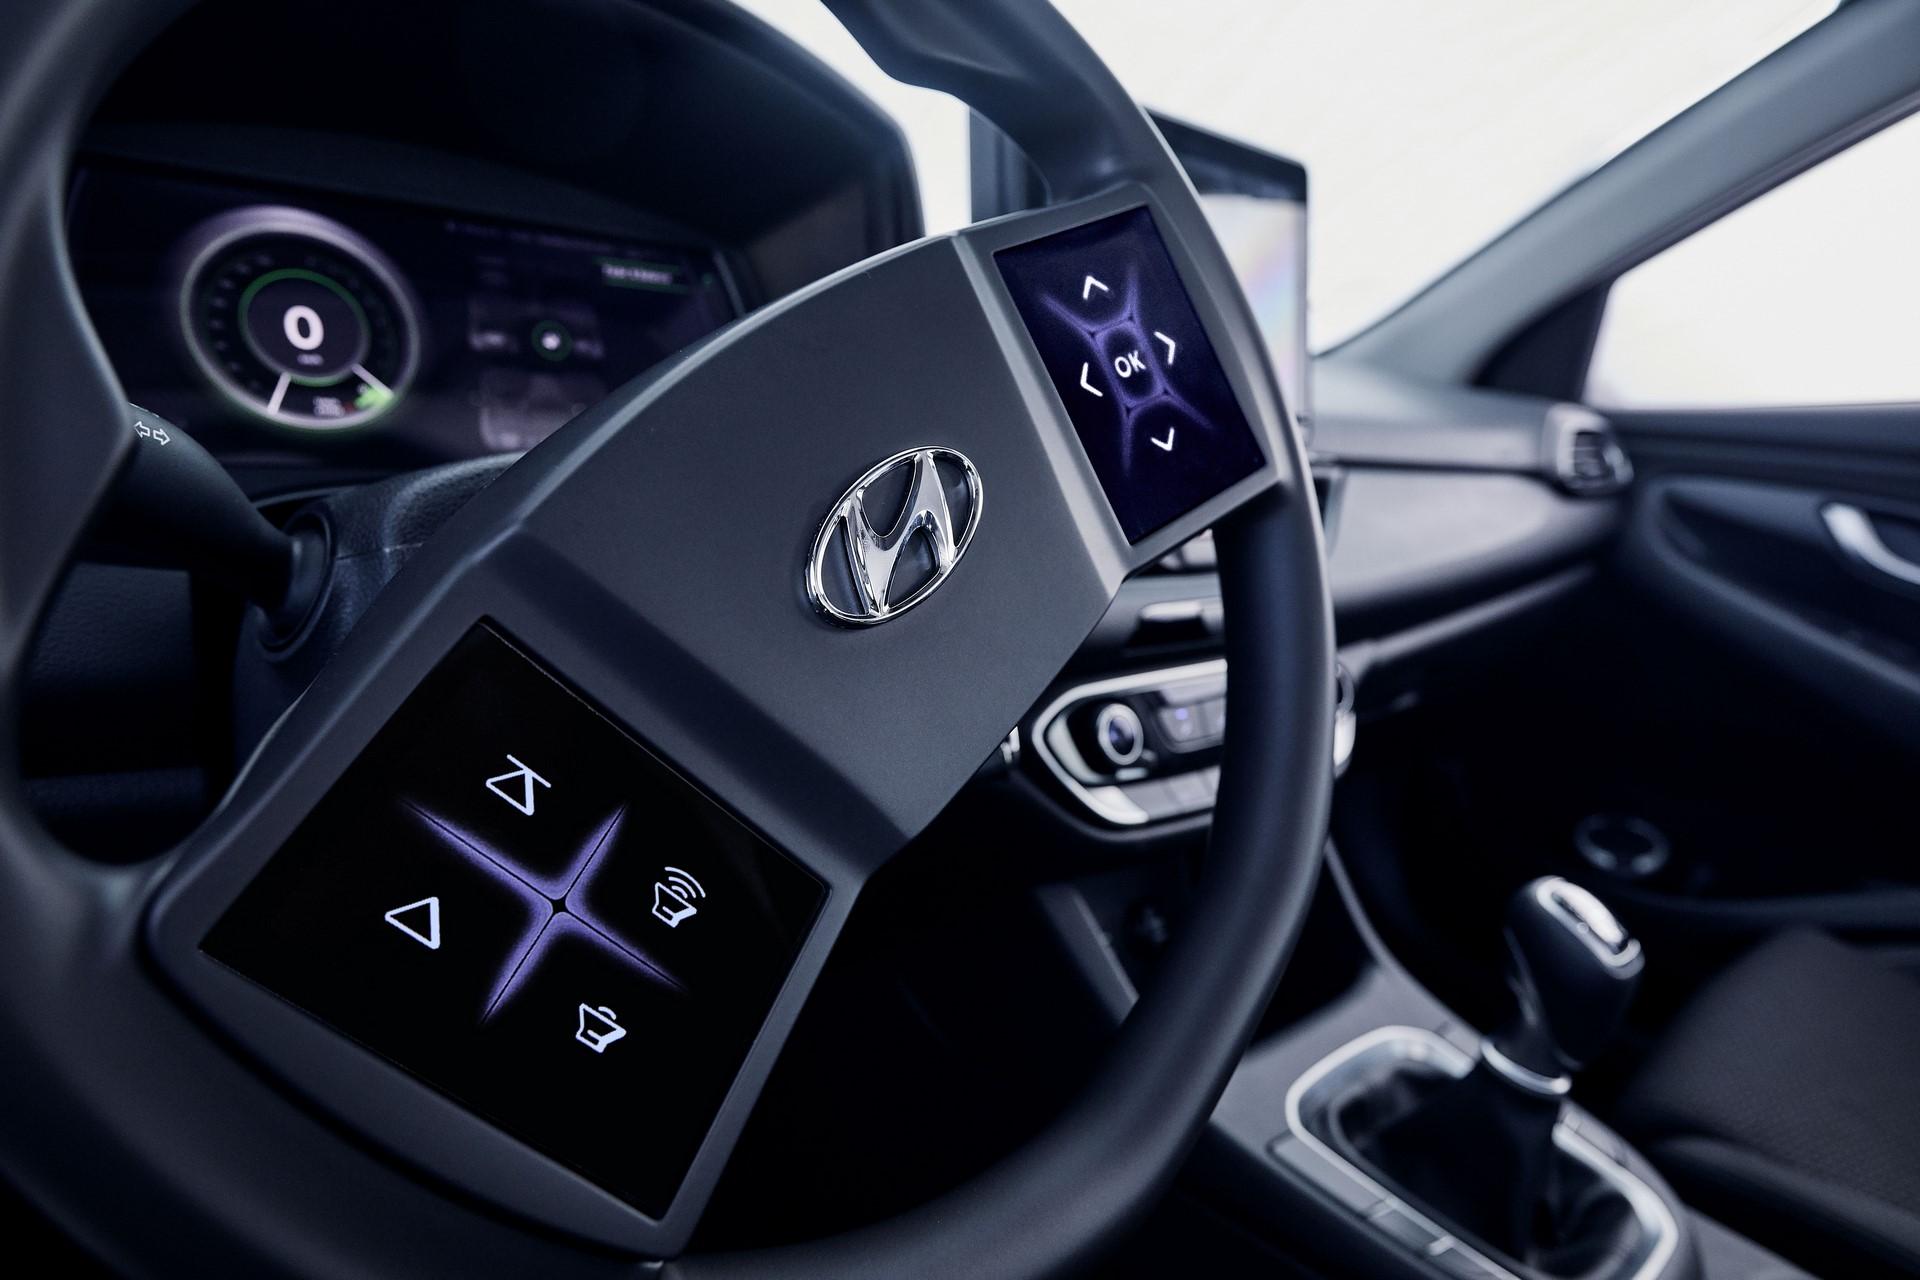 Hyundai-Virtual-cockpit-2019-Hyundai_TechDay_i30_Workshop_238-5